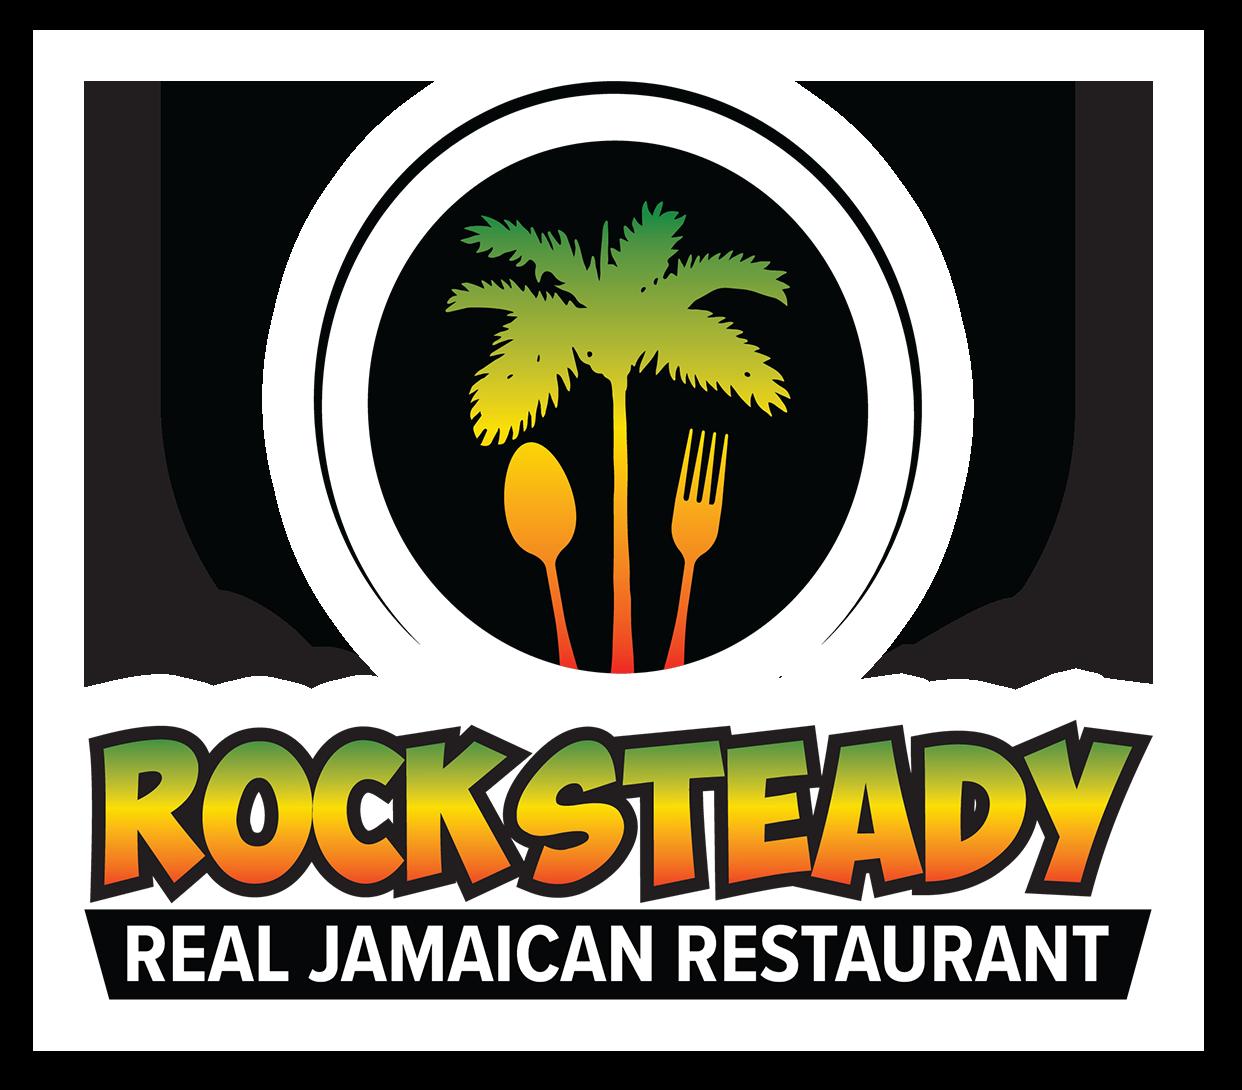 Rock Steady Real Jamaican Restaurant